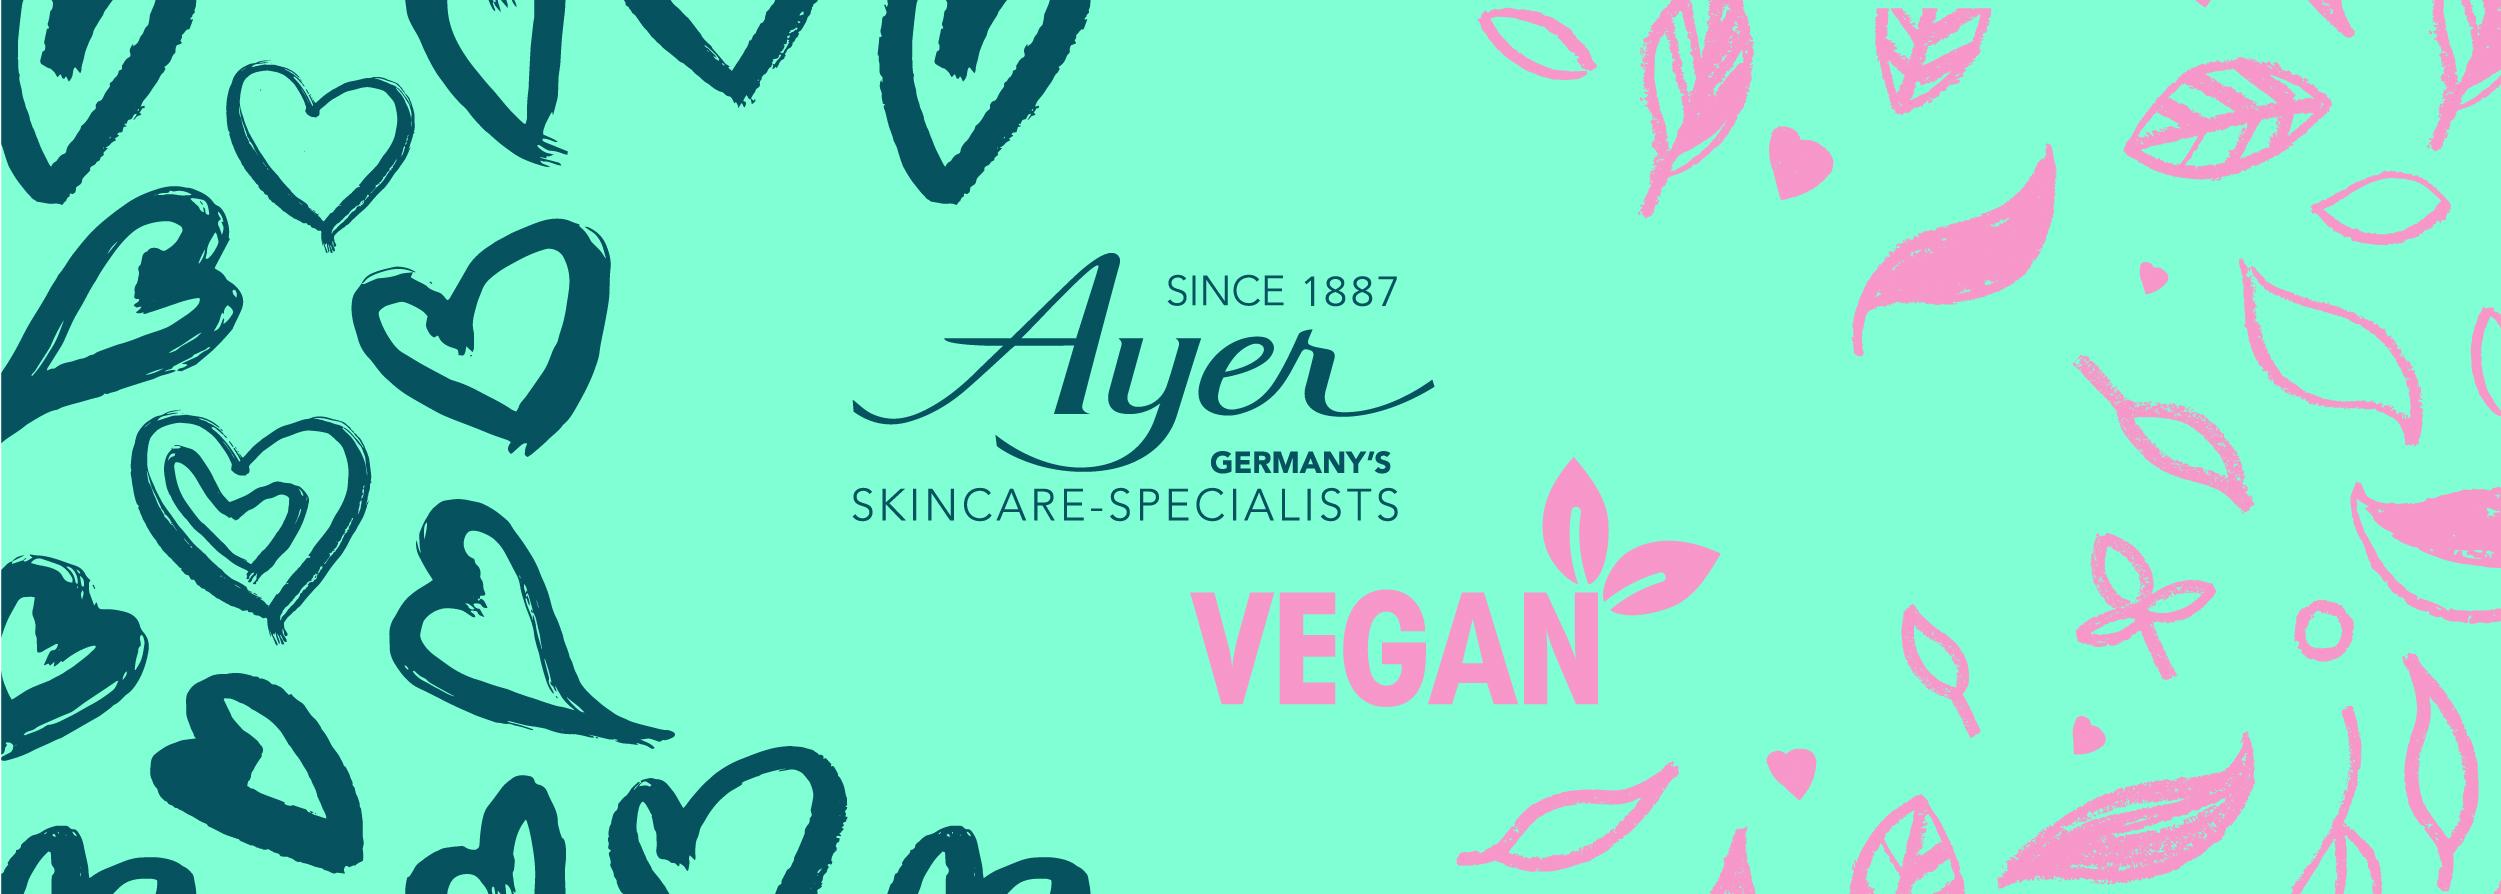 Ayer_Linien_Vegan_Slider_EN_2500x893px_RGB_V1-0_01-03-2021